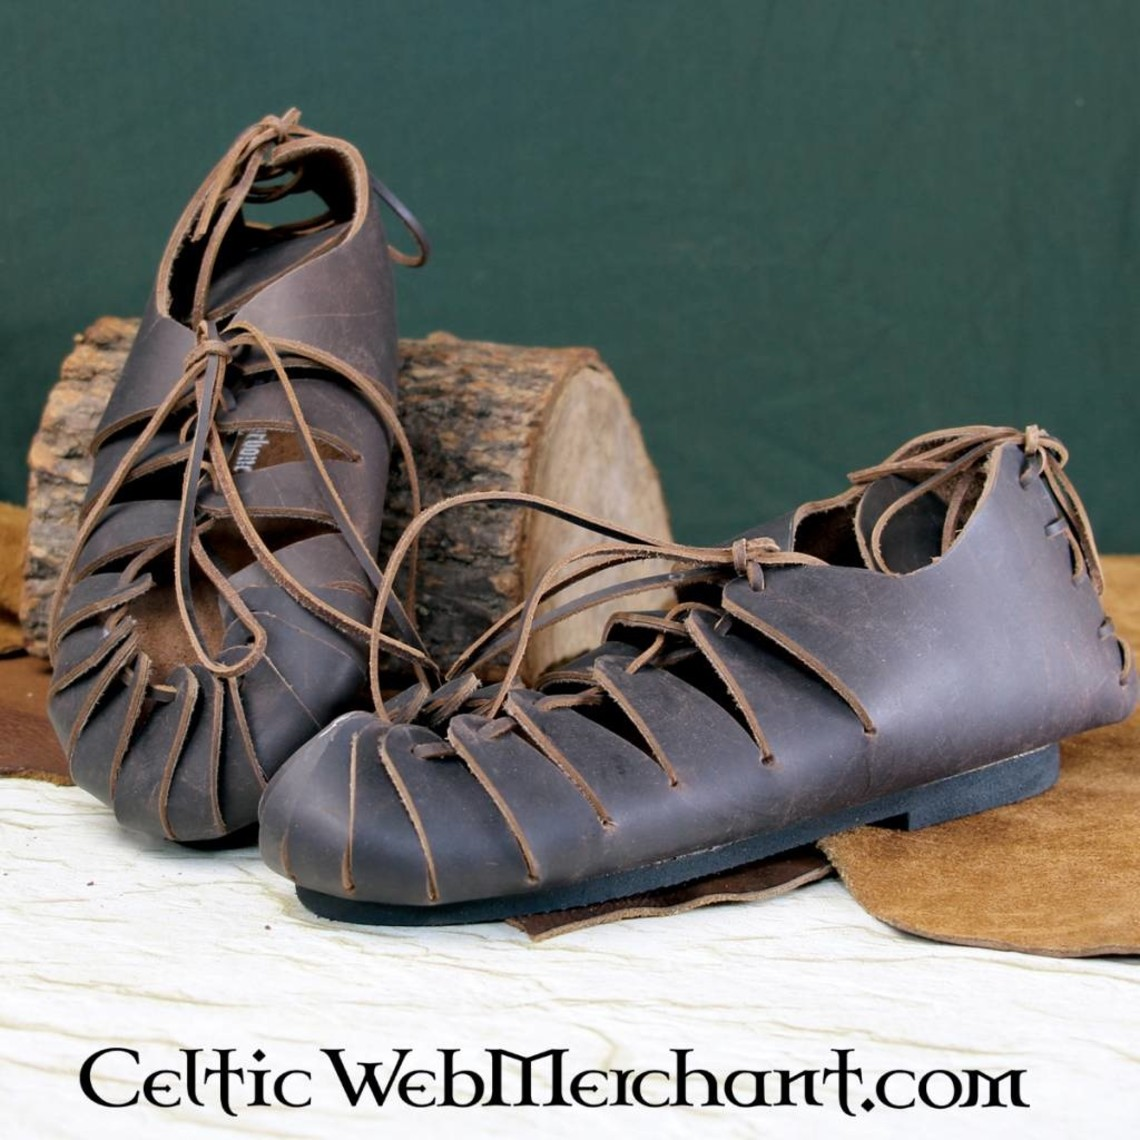 Leonardo Carbone Cuero Iron Age sandalias